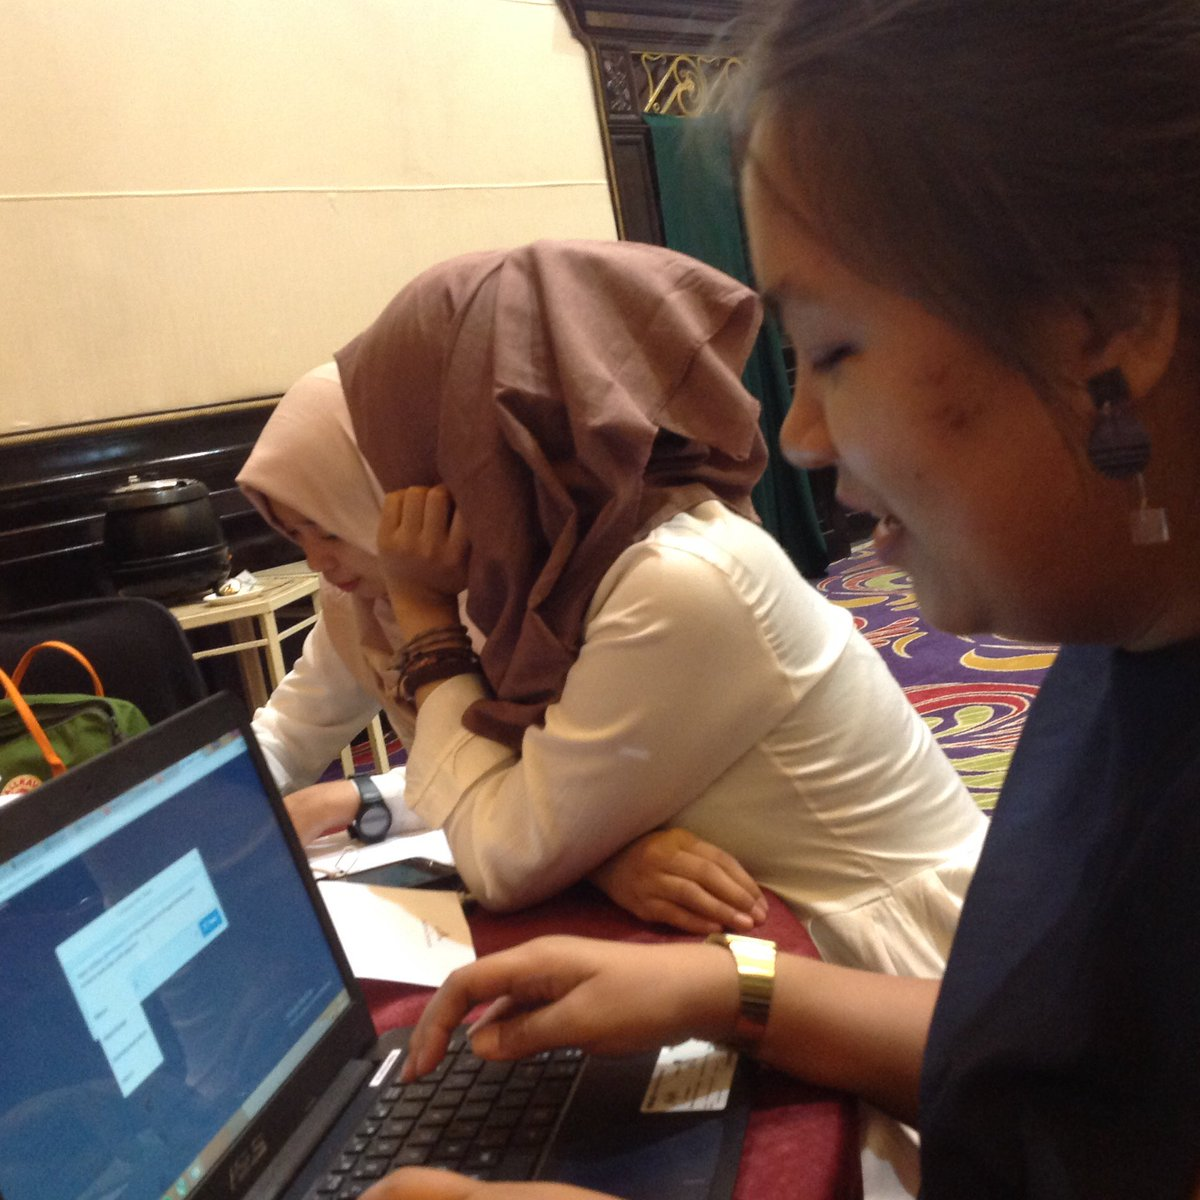 Kesibukan dari tim panitia yang patut di acungi jempol . #Mediawave6th #MWeraihBerkah https://t.co/TxJdGZLGCj